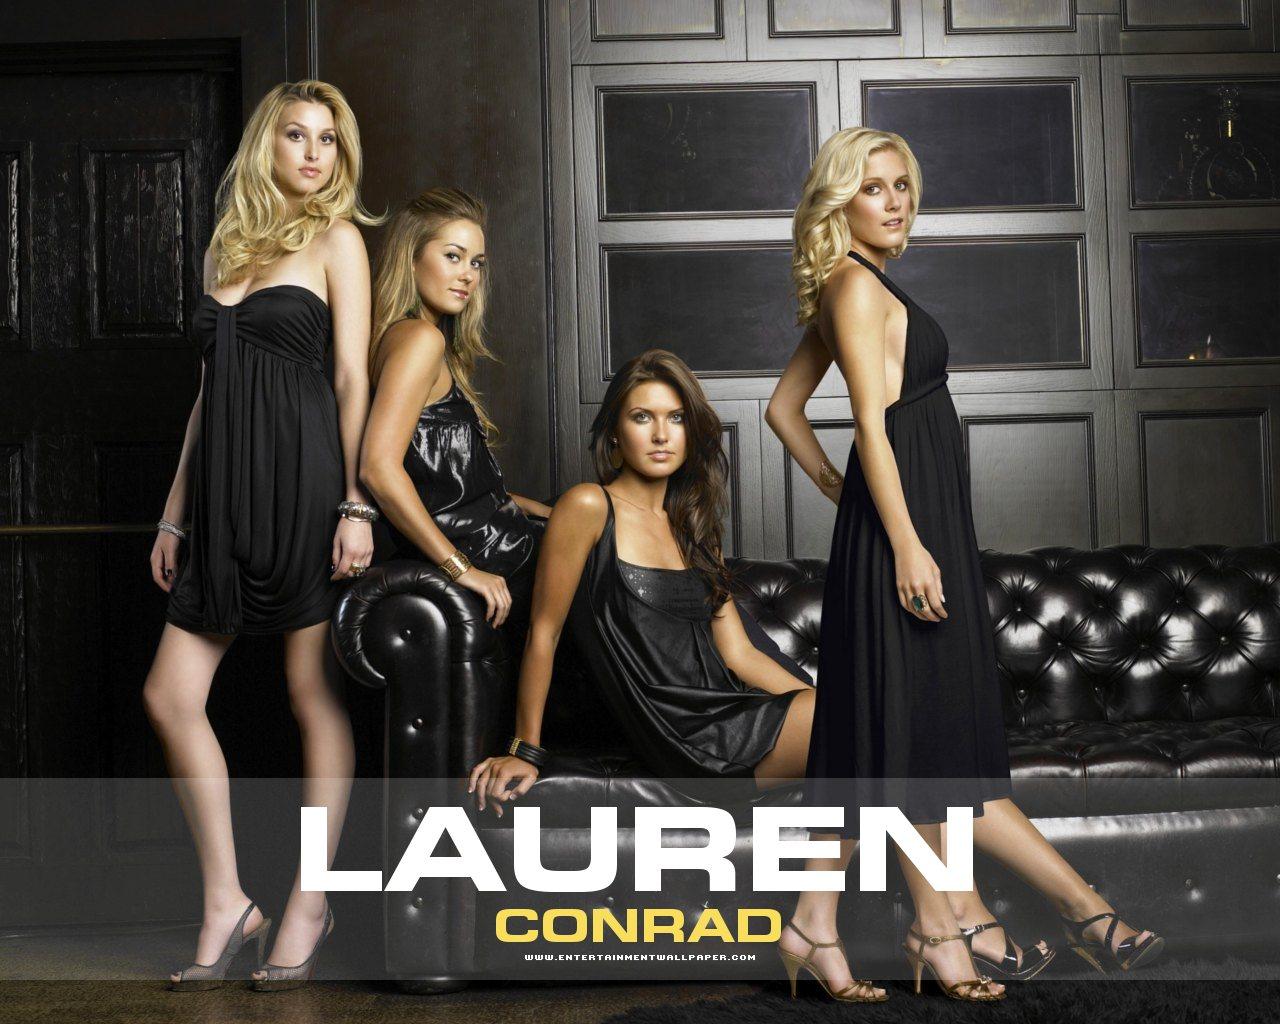 http://images.fanpop.com/images/image_uploads/Lauren-Conrad--lauren-conrad-645256_1280_1024.jpg